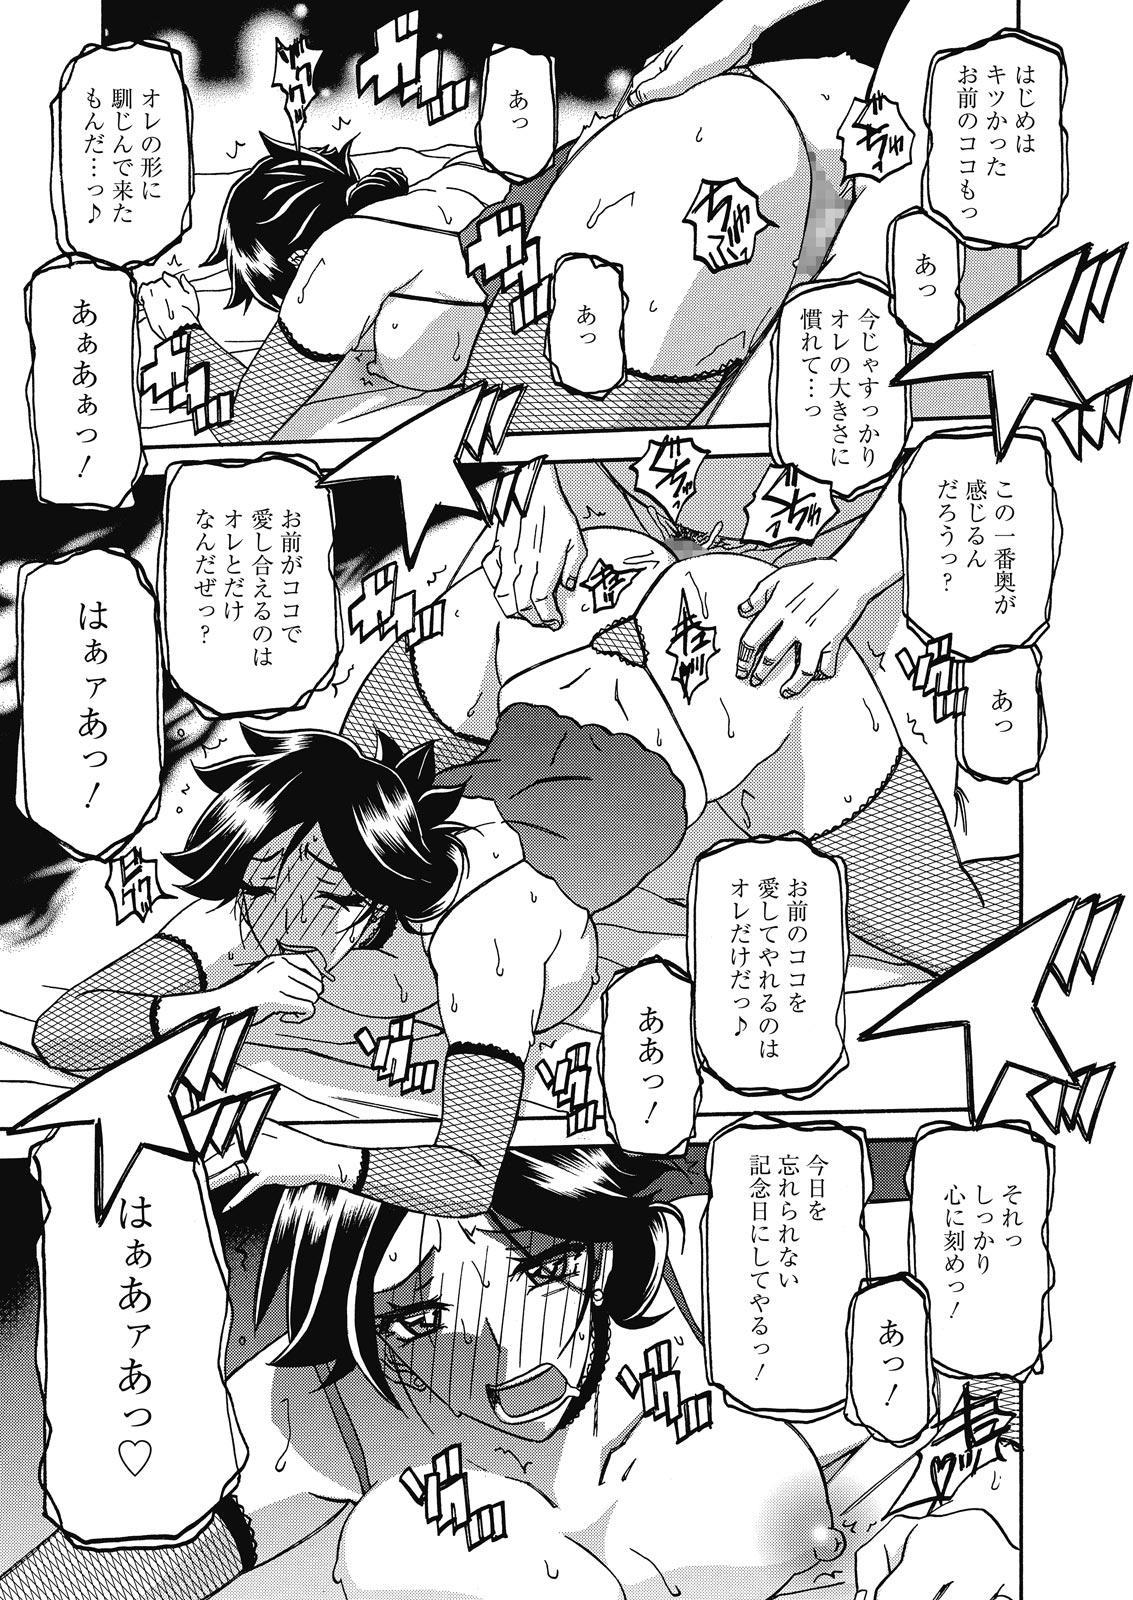 Web Manga Bangaichi Vol. 7 62